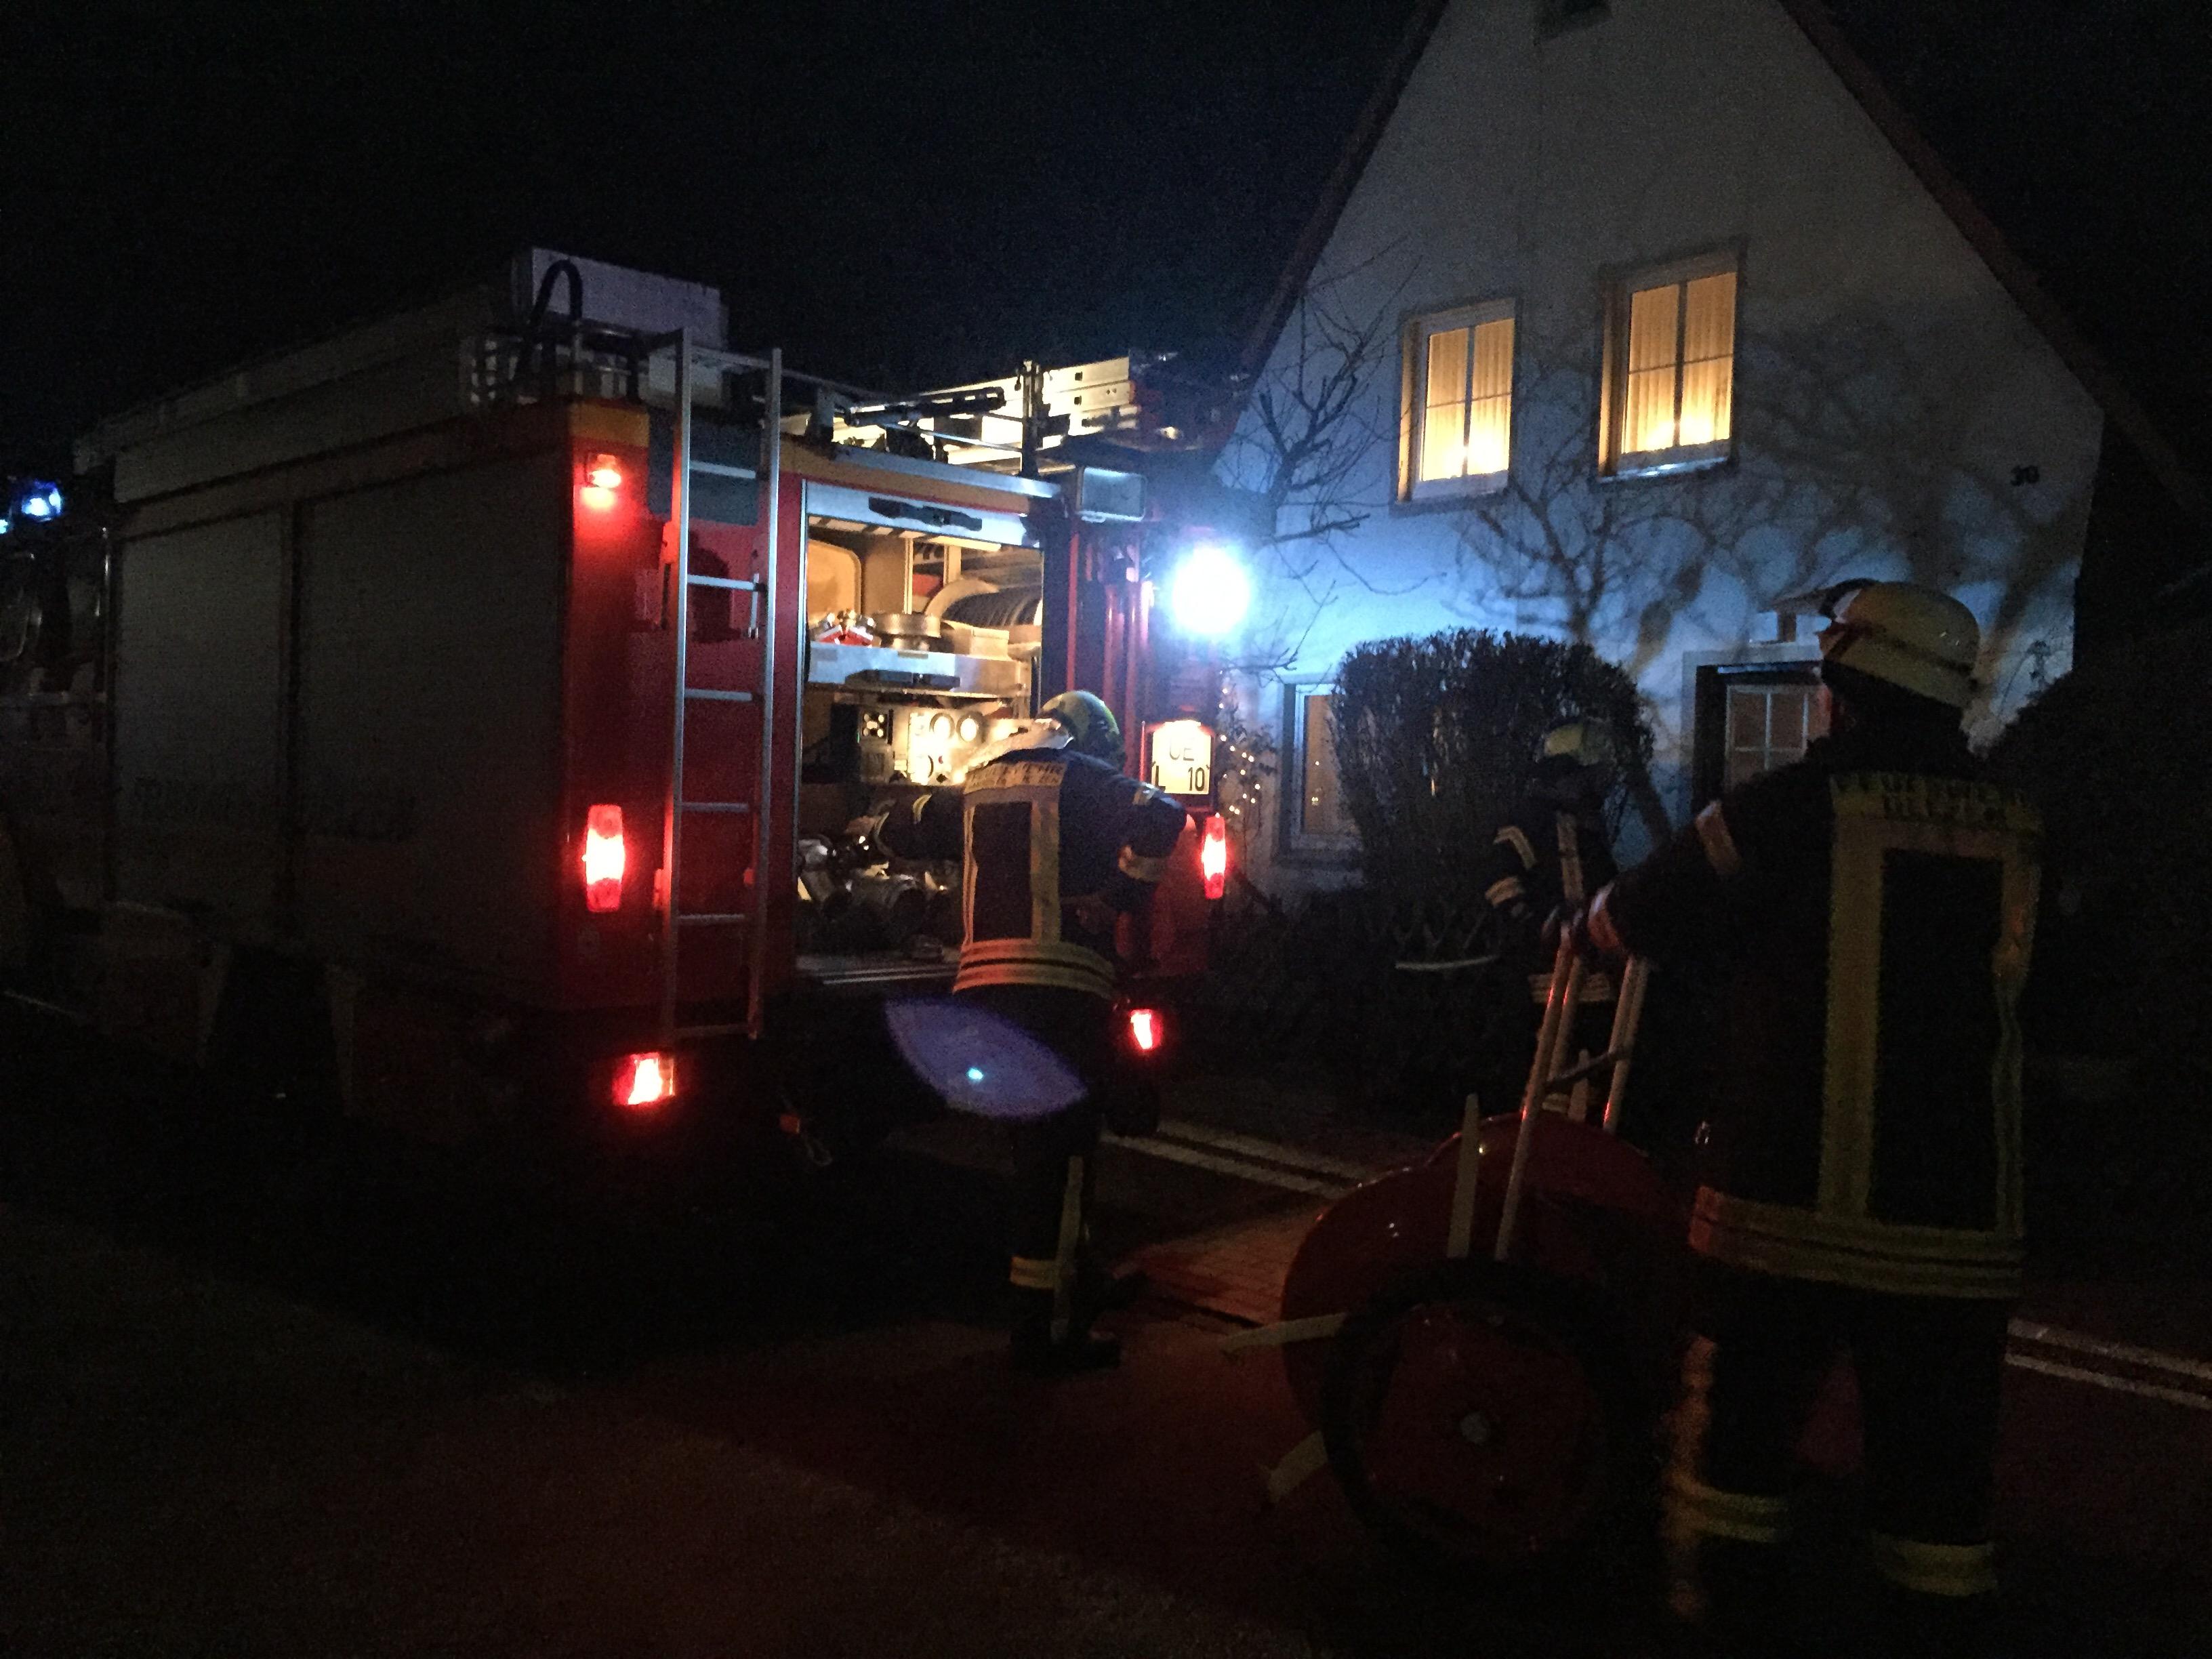 313. Brennt Baum an Gebäude